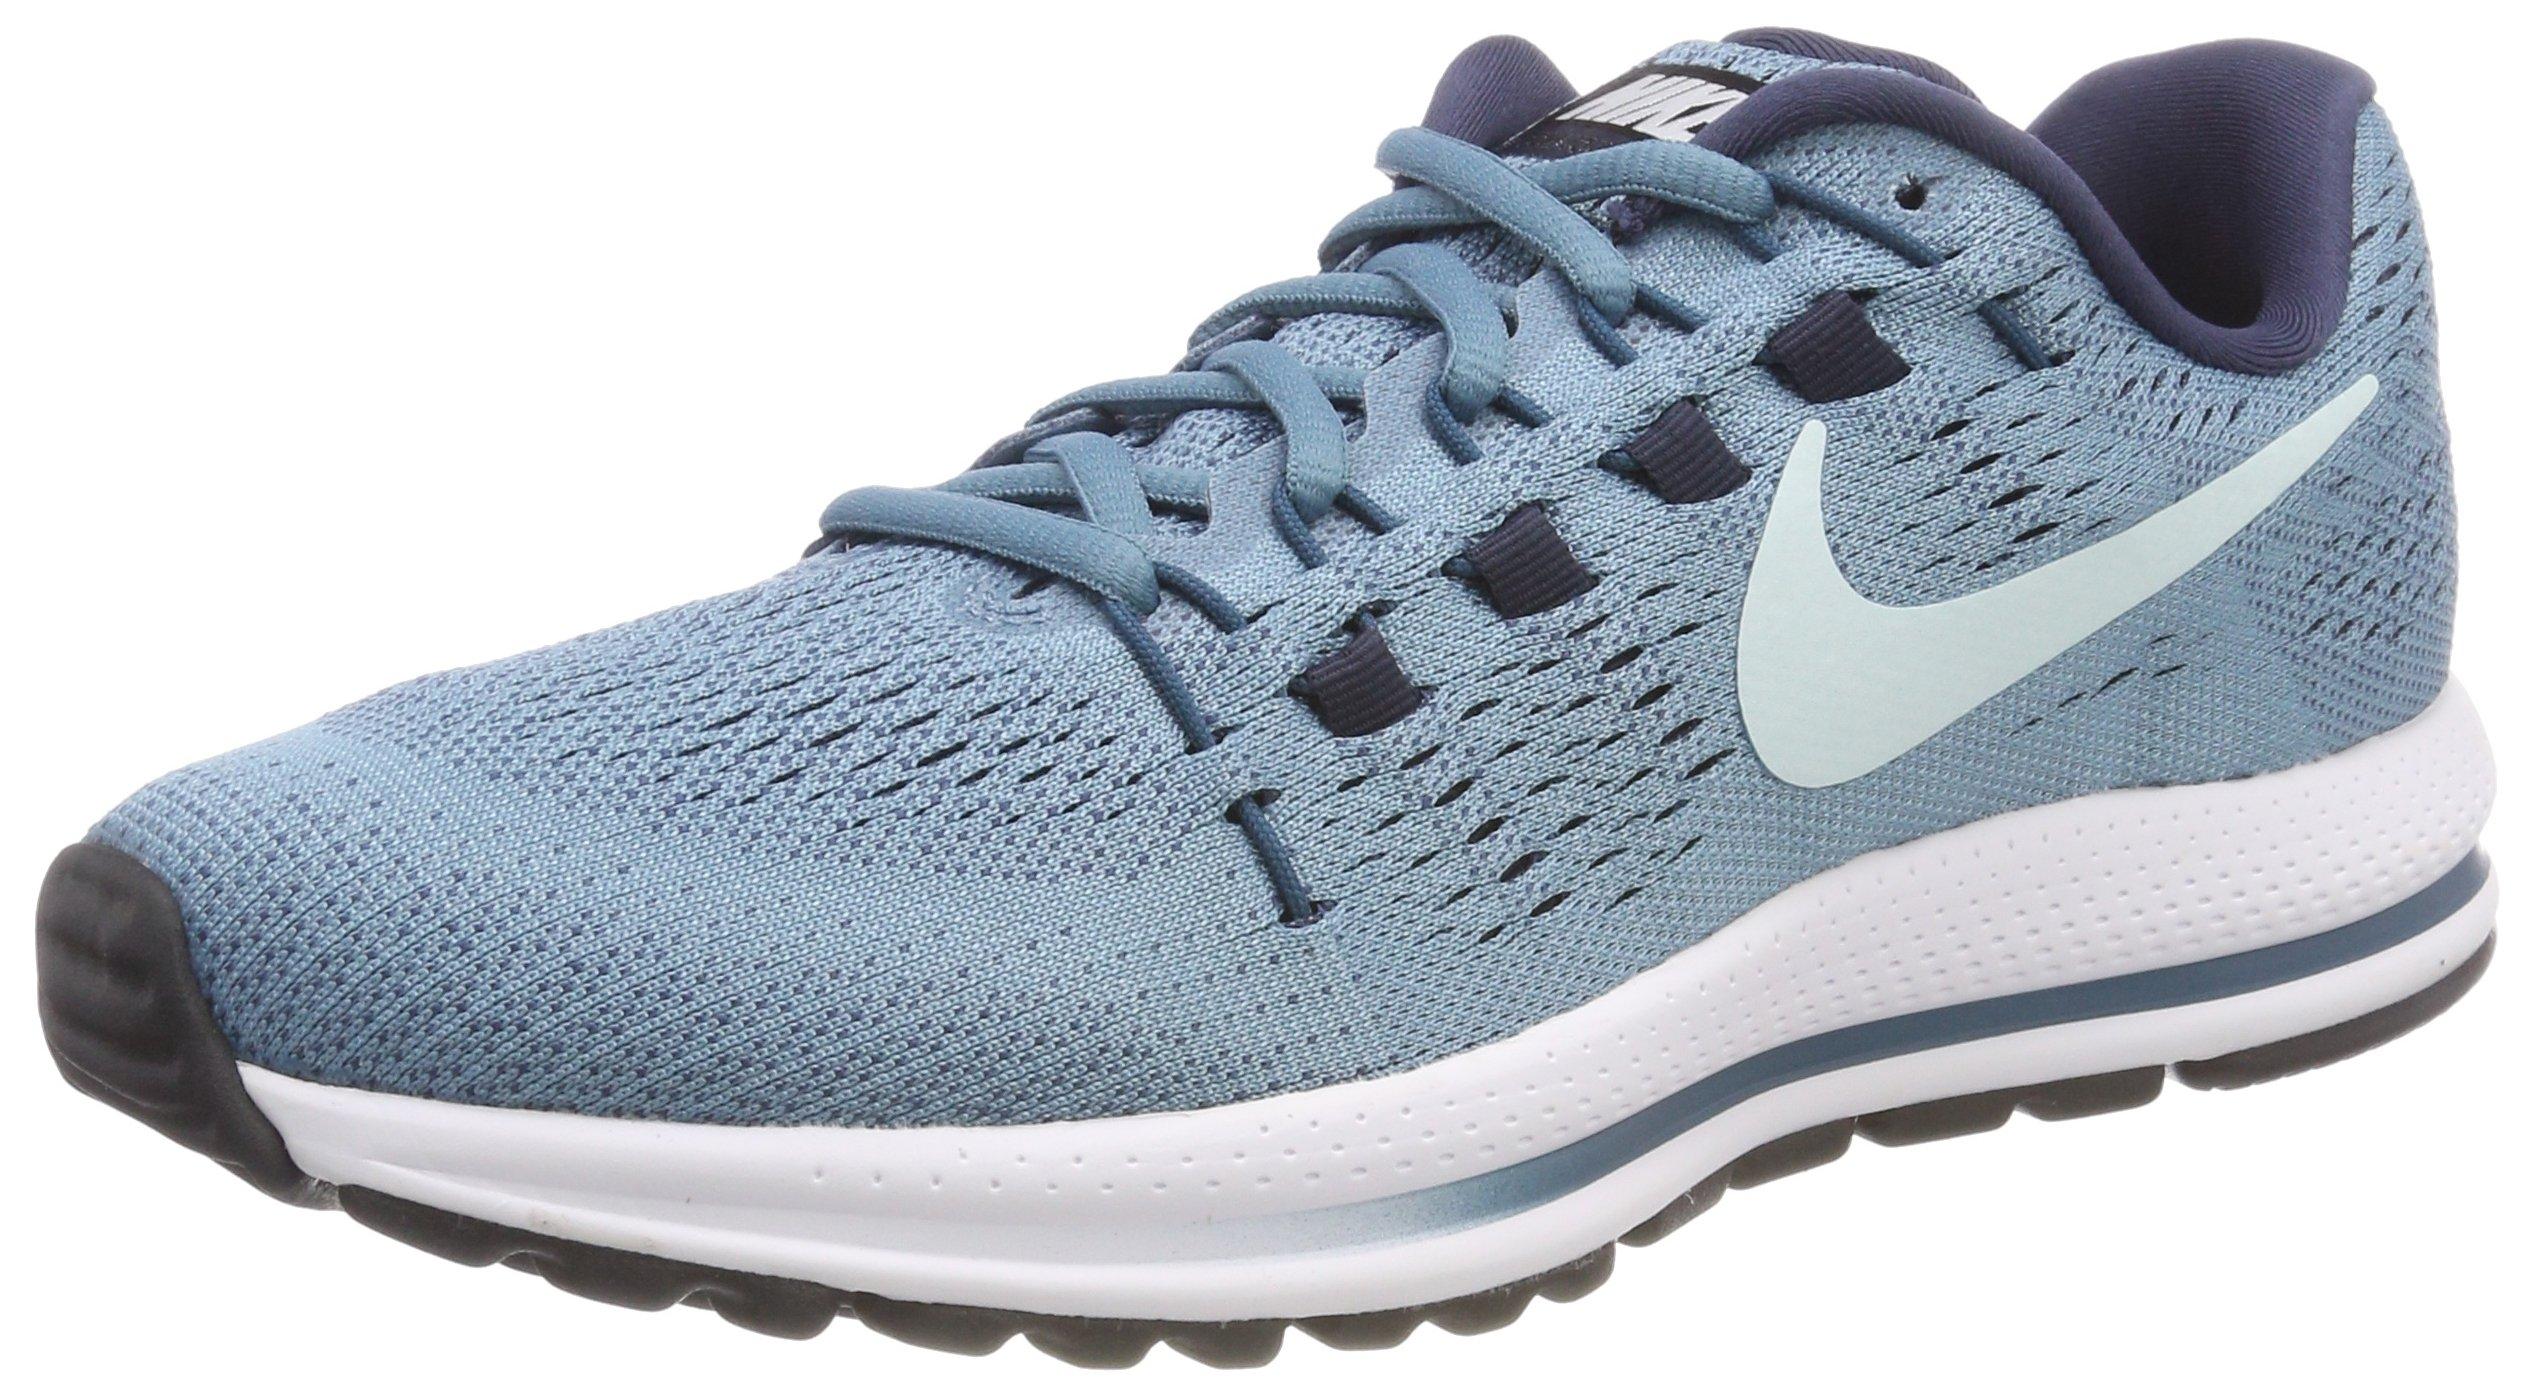 a906e104a2f6 Galleon - Nike Women s Air Zoom Vomero 12 Running Shoe Cerulean Glacier Blue -Thunder Blue 8.5